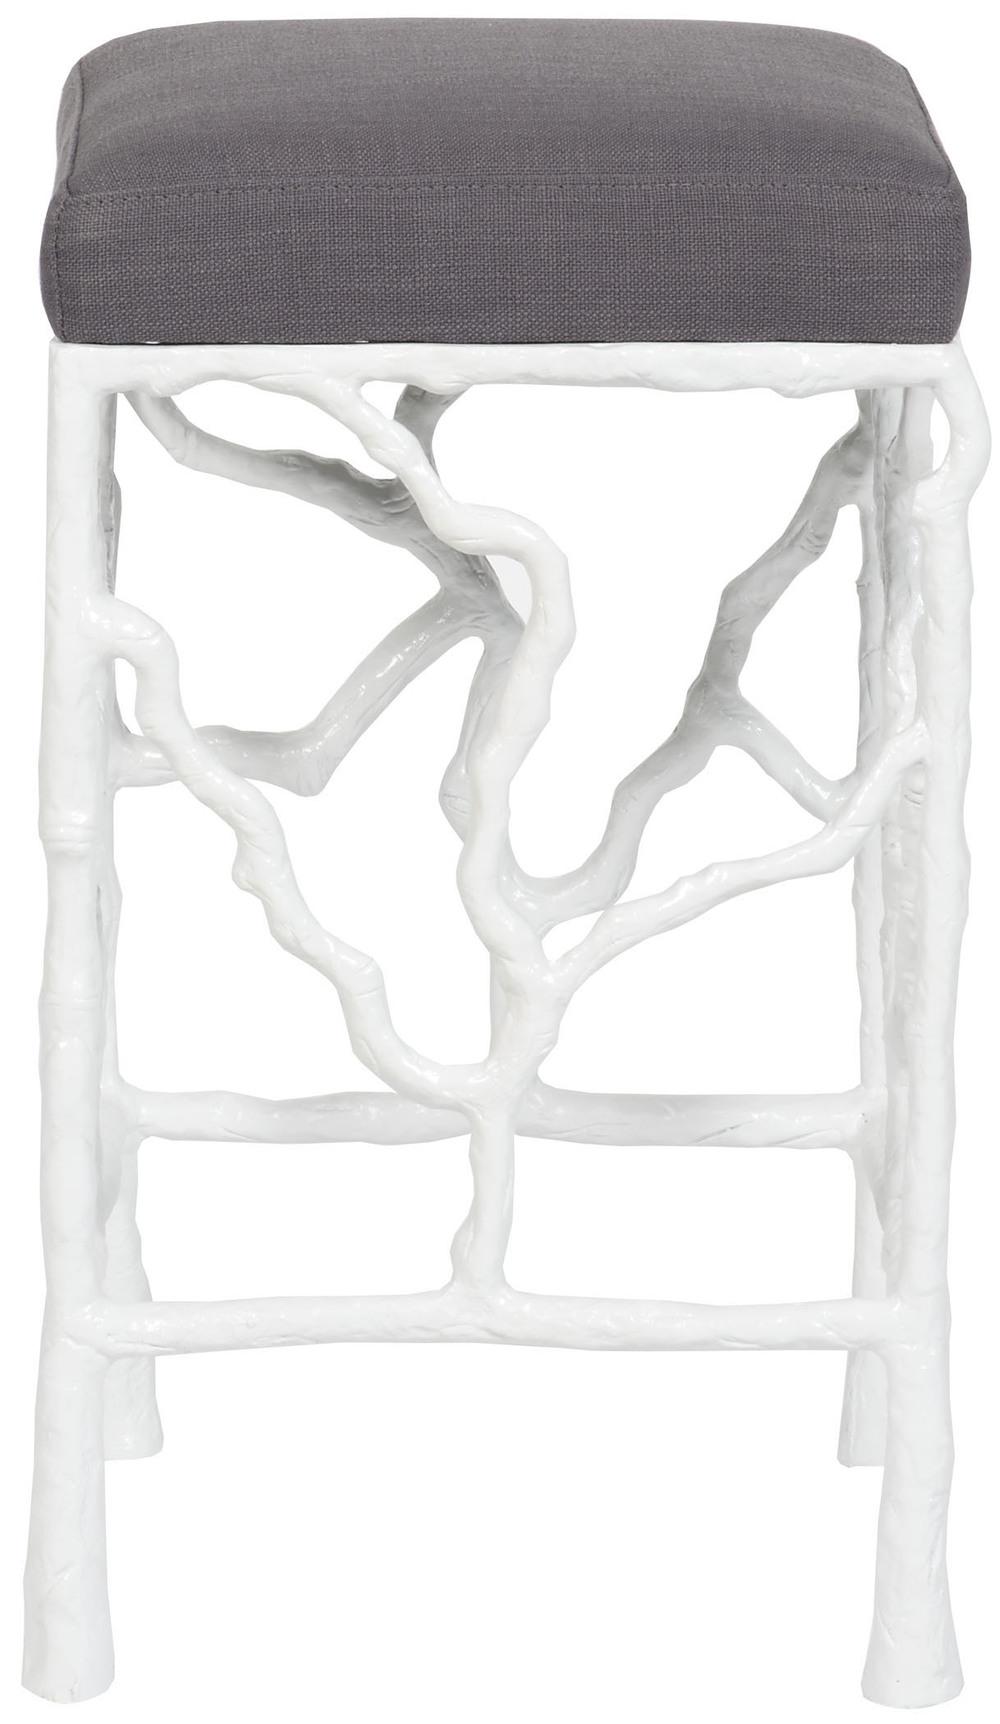 Vanguard Furniture - Piers Metal Frame Counter Stool